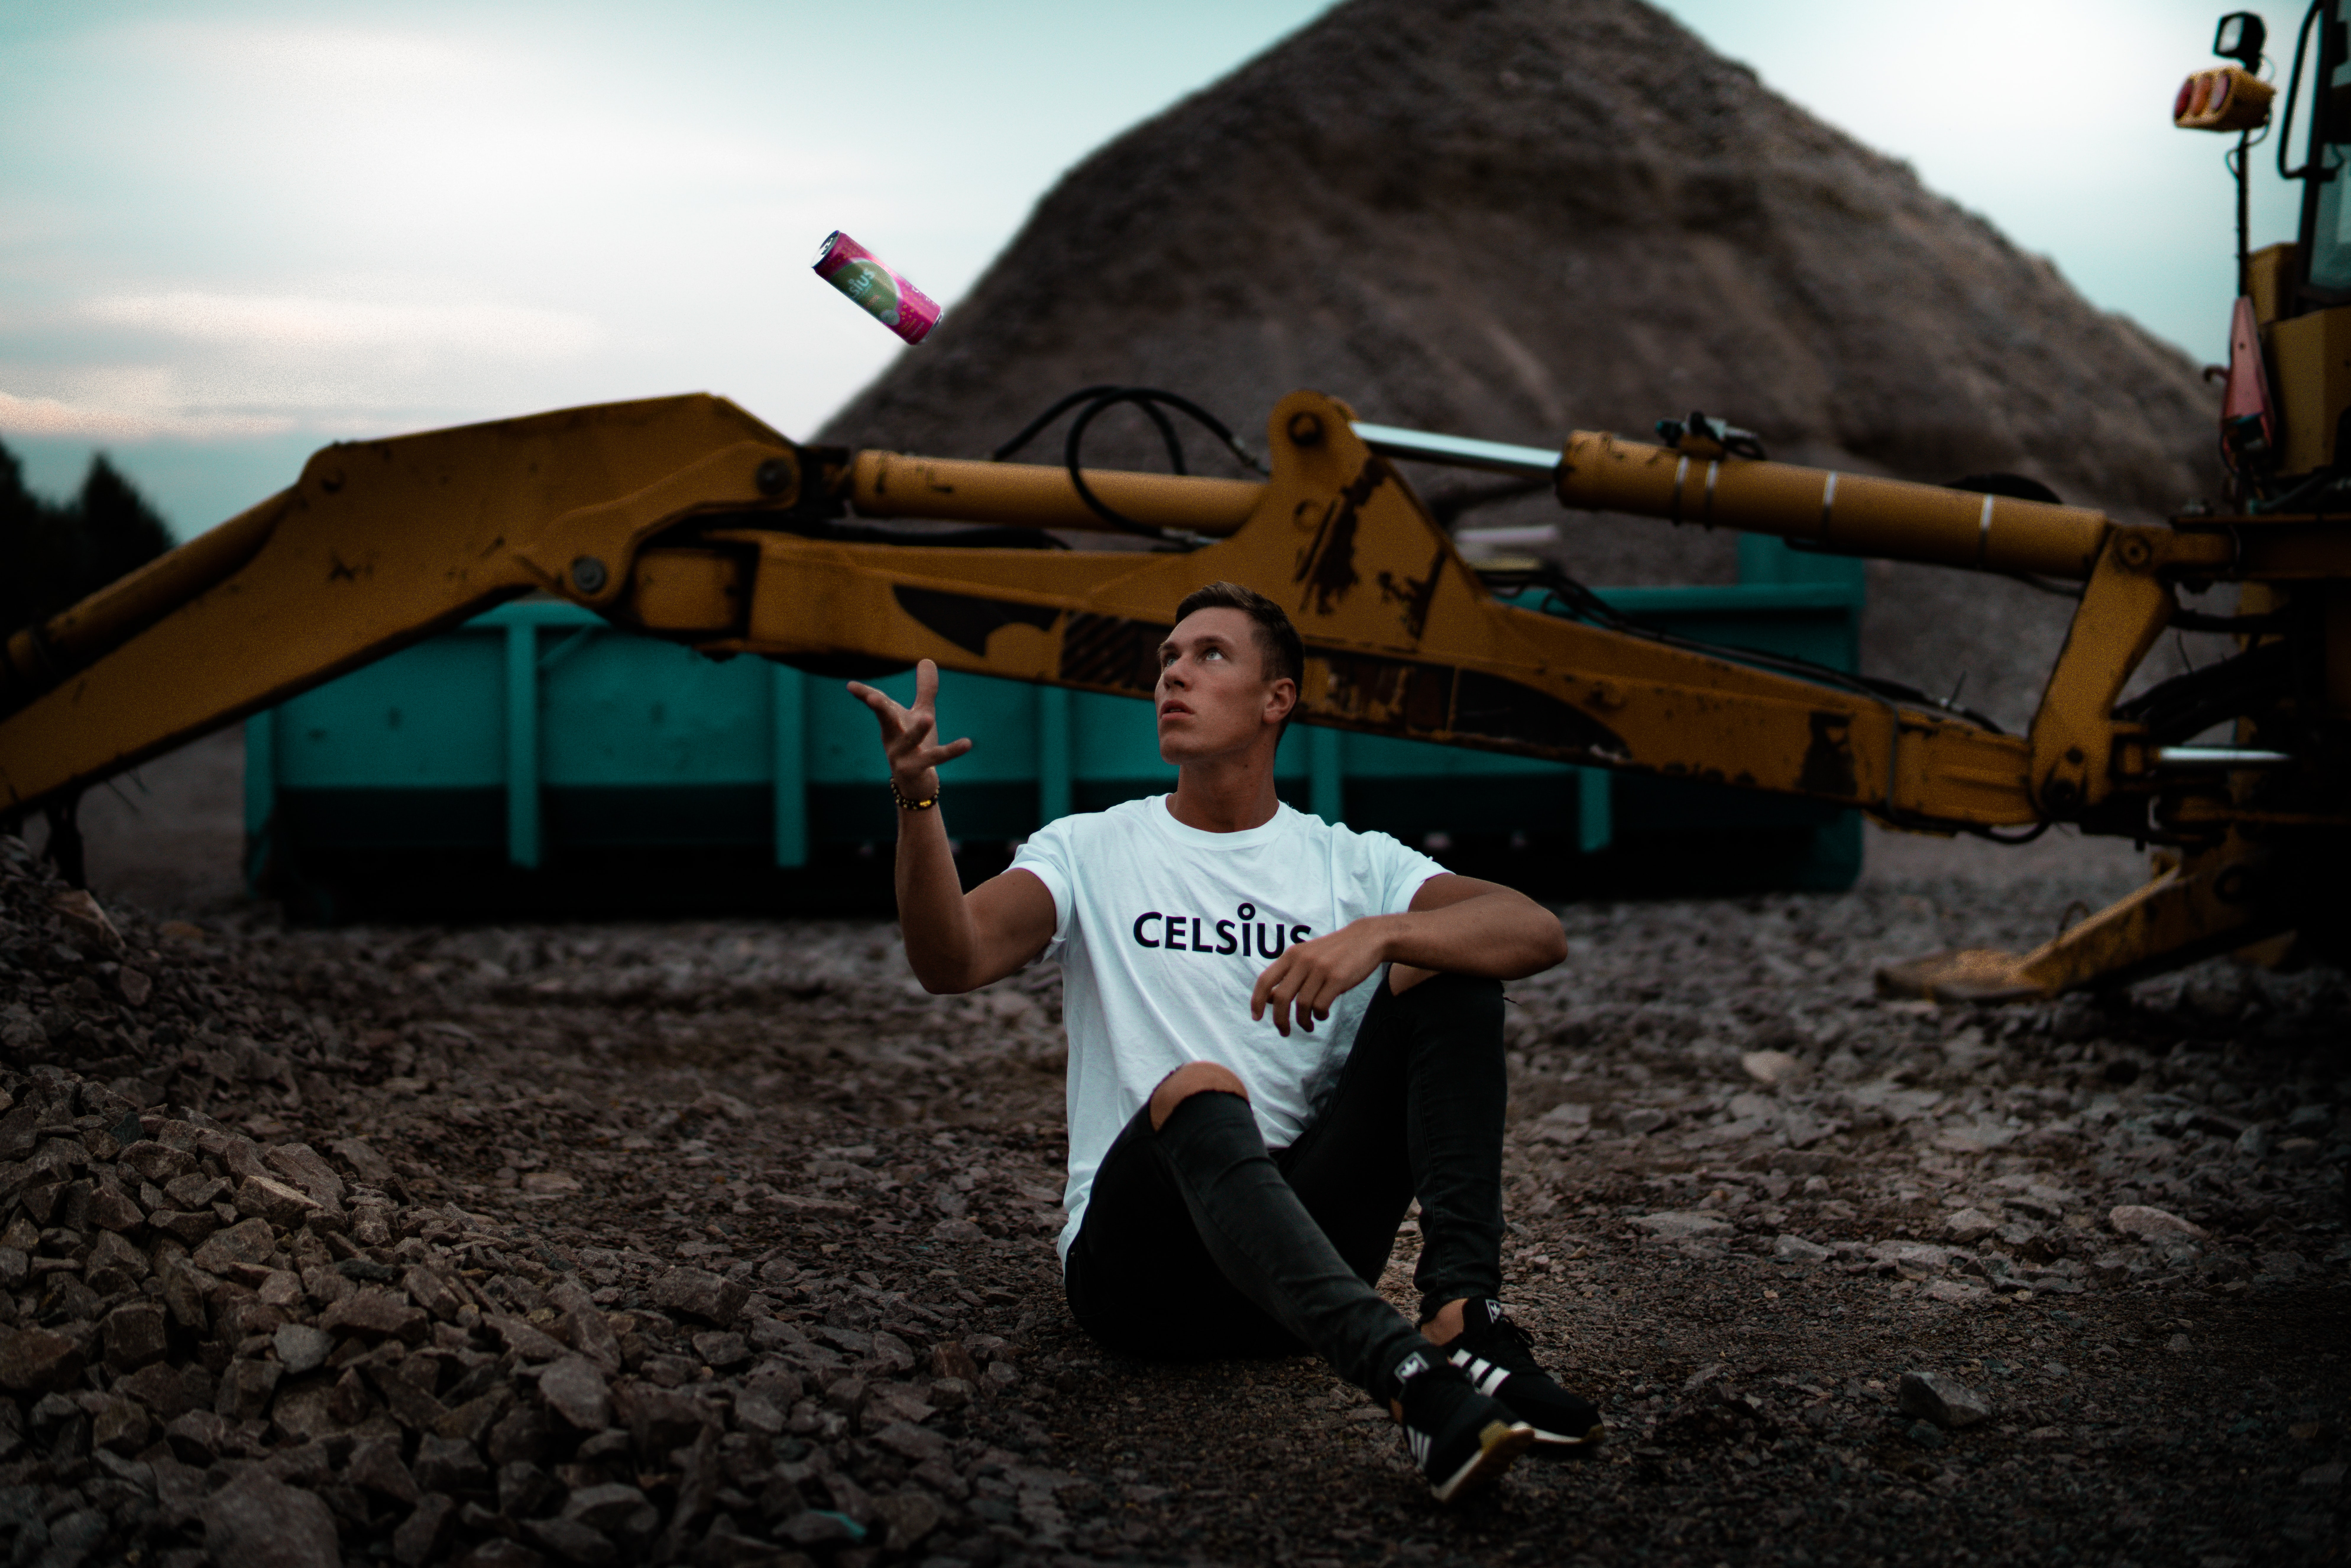 man sitting on the ground near excavator